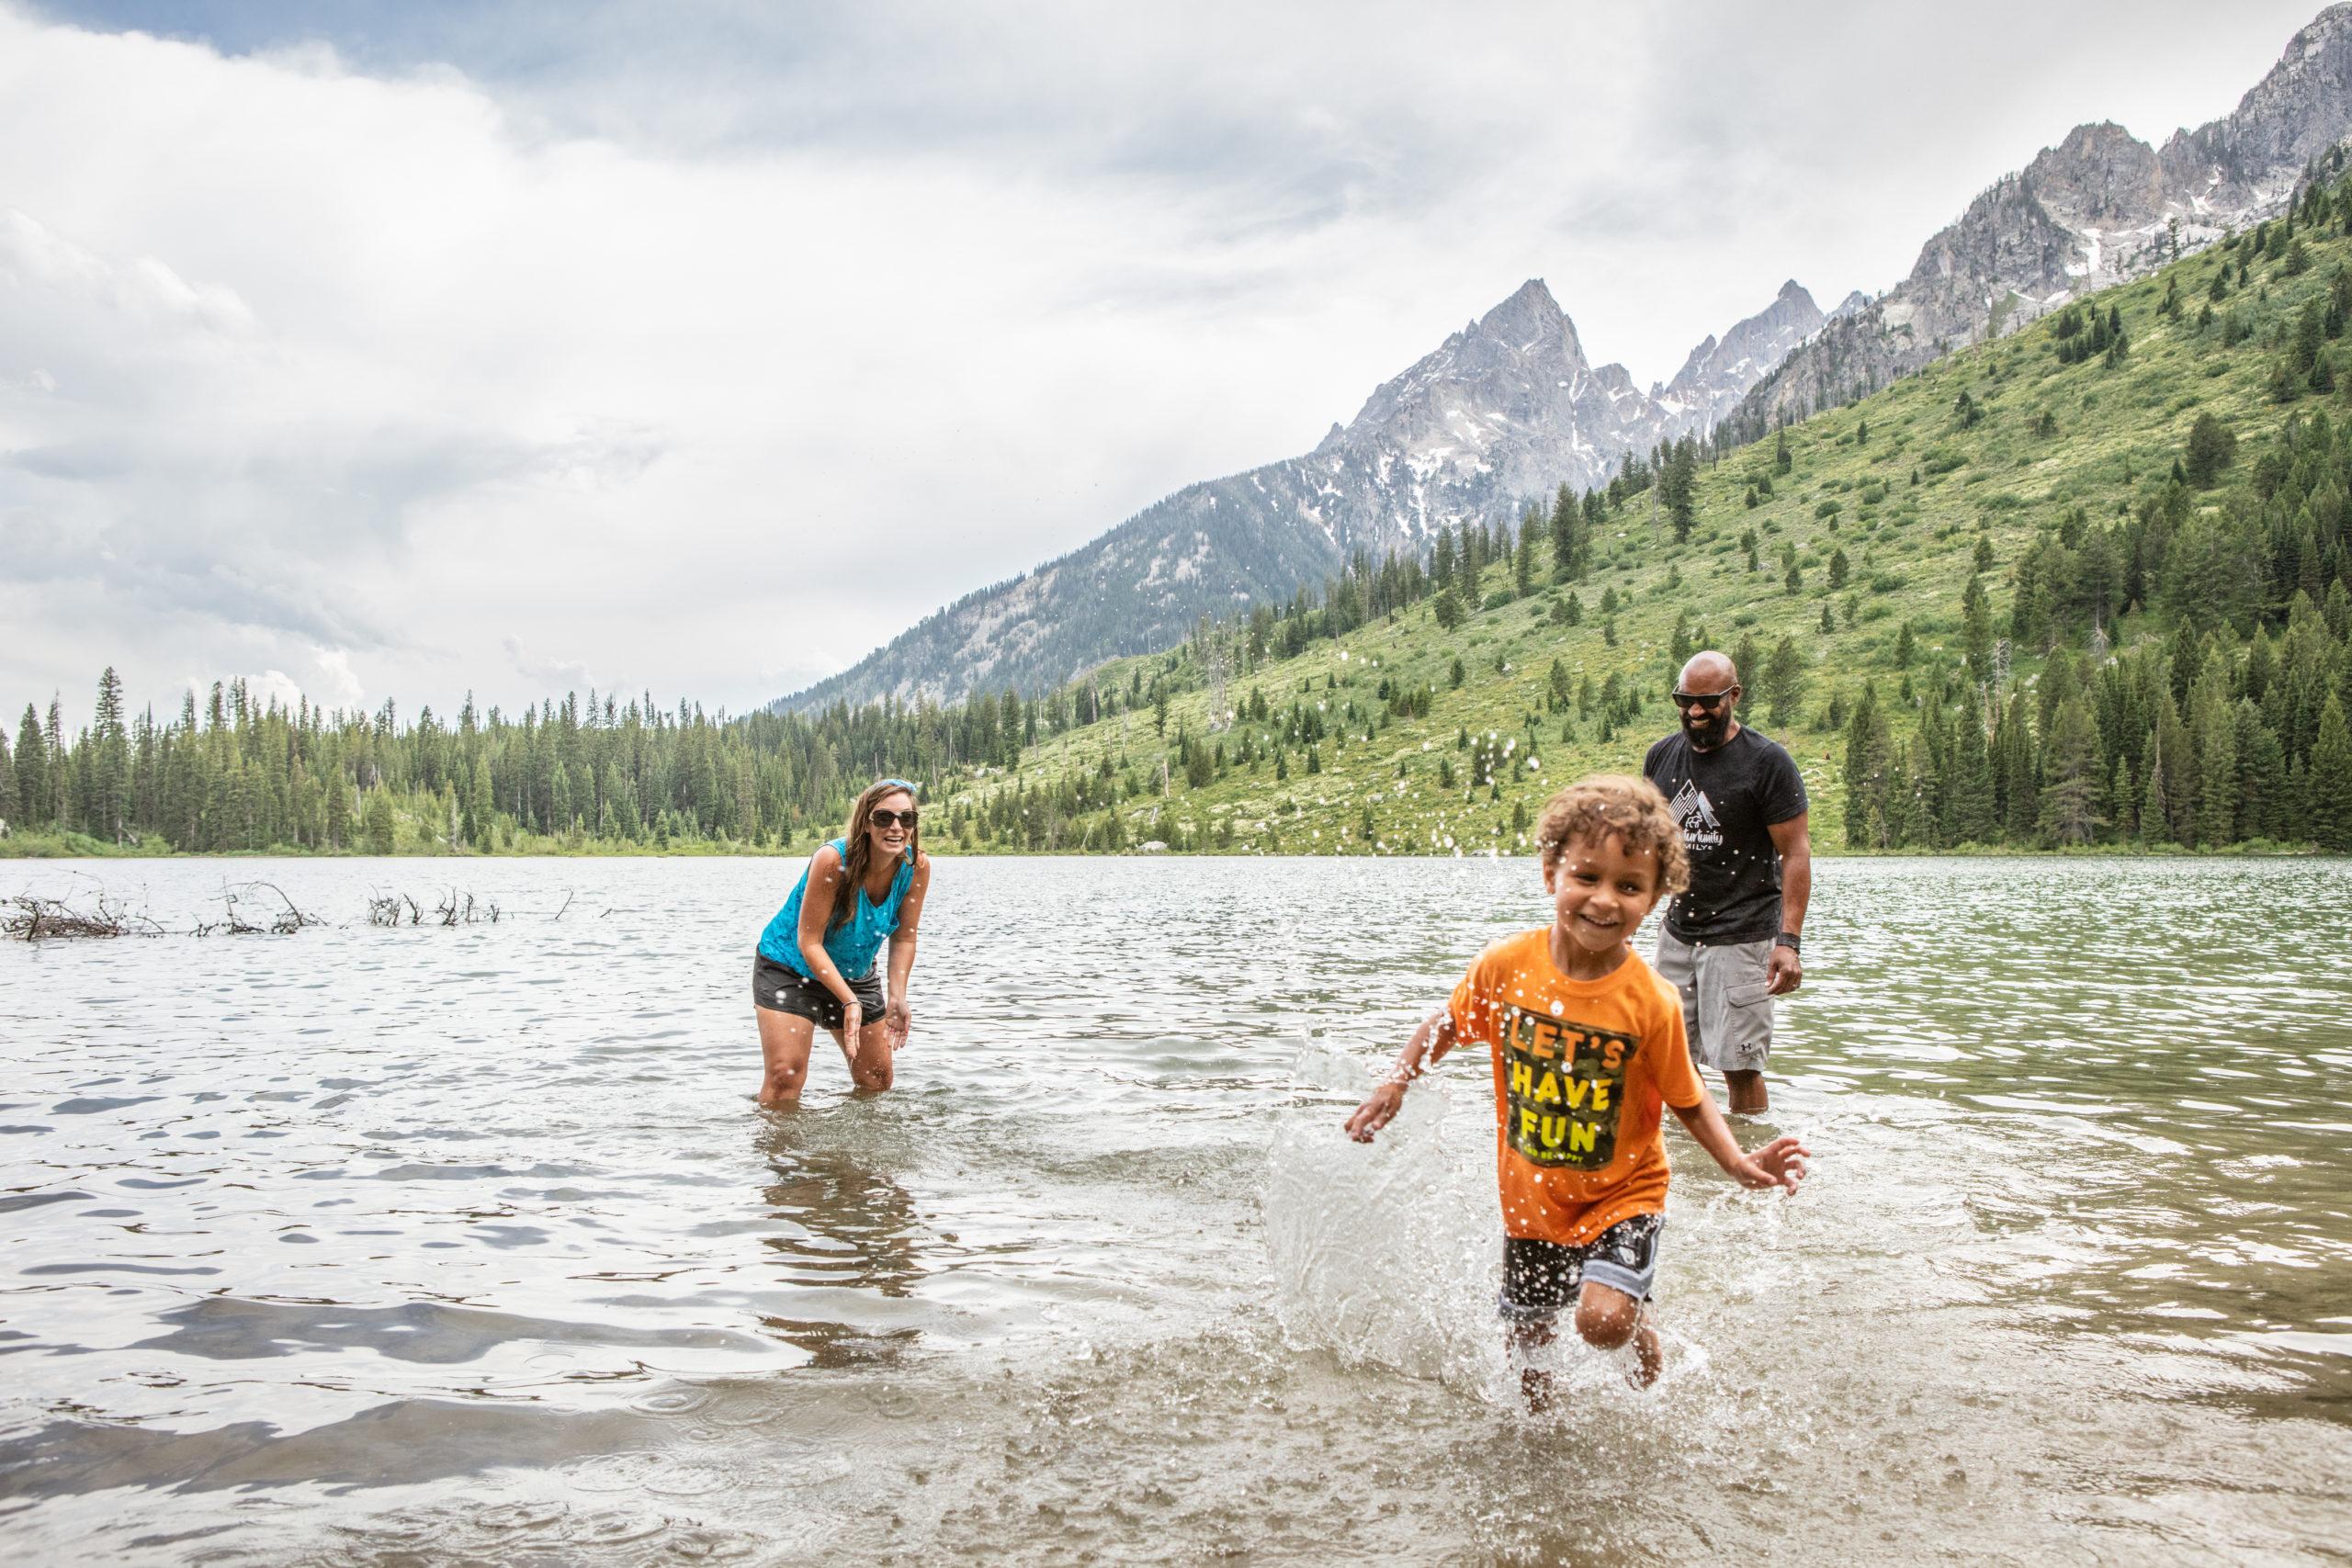 Adventurtunity Family at Tetons